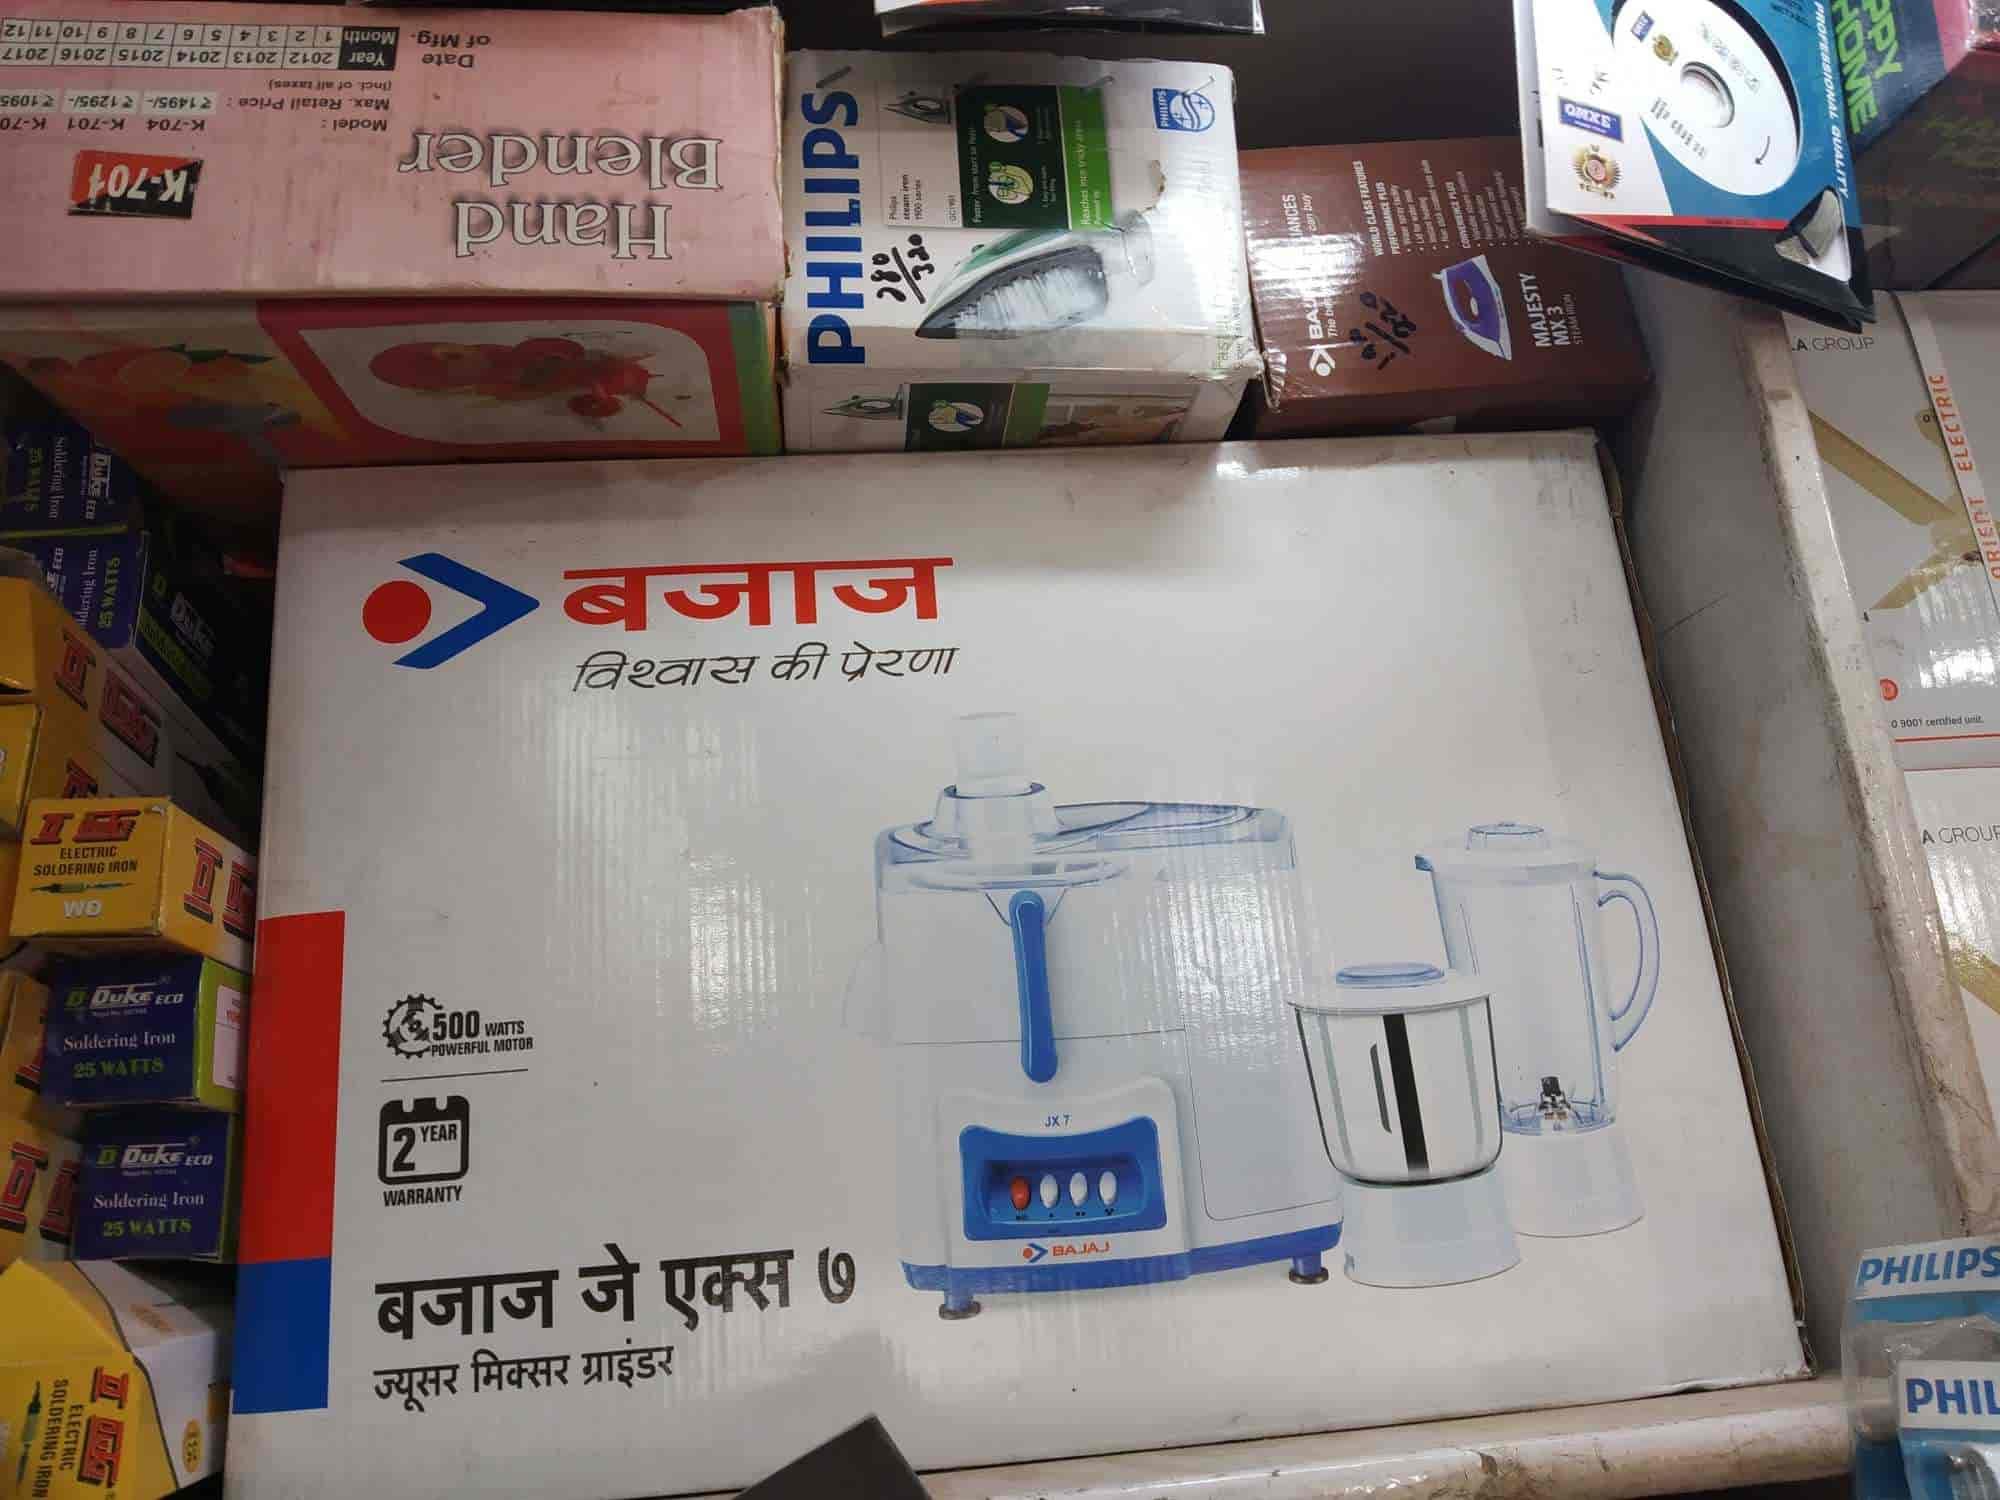 Satti Electrical Work, Kurali - Electricians in Chandigarh - Justdial